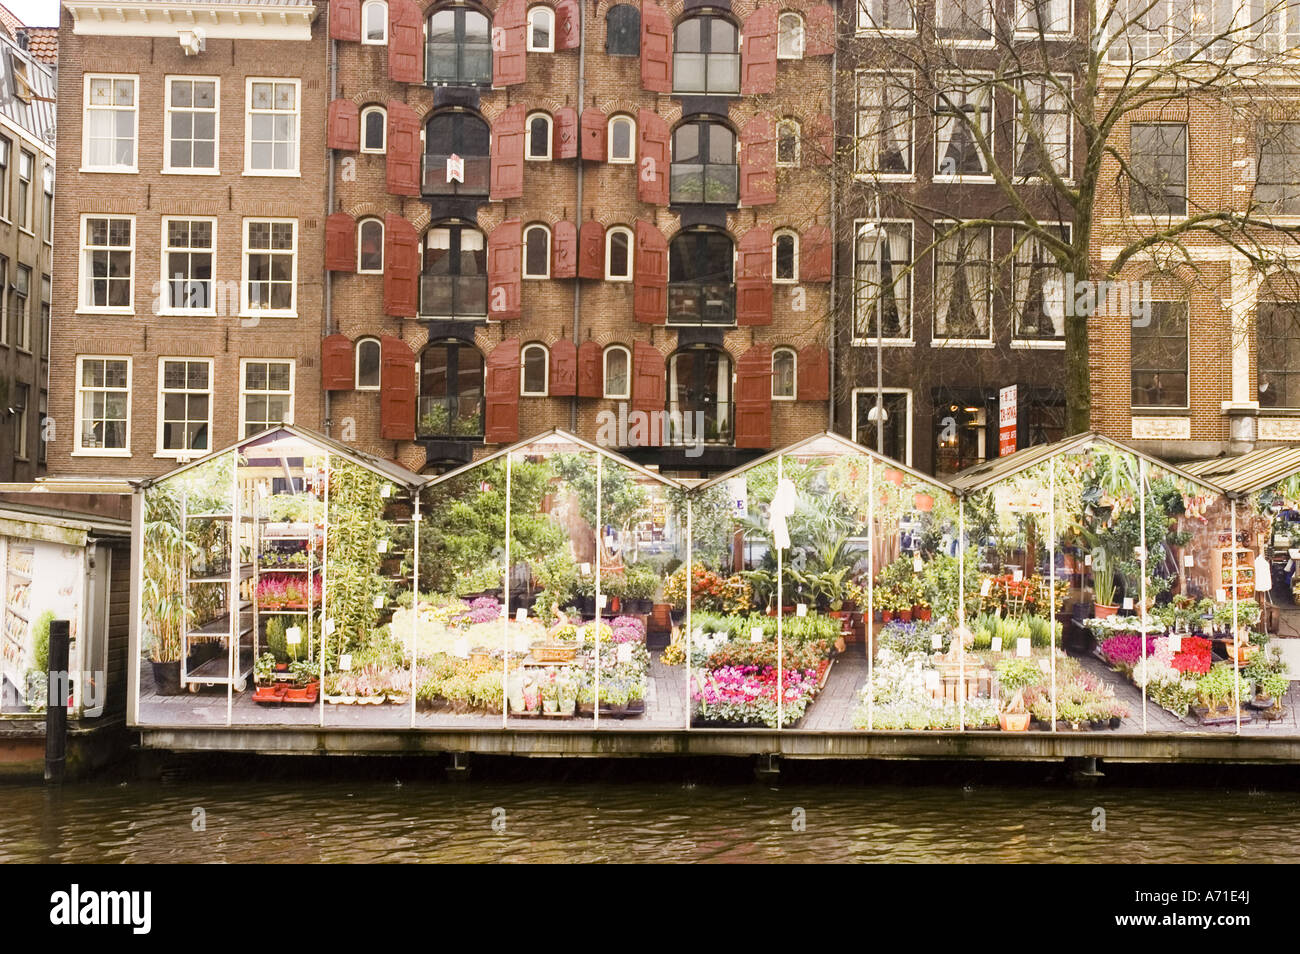 Floating Flower Market.Floating Flower Market Singel Canal Amsterdam Holland